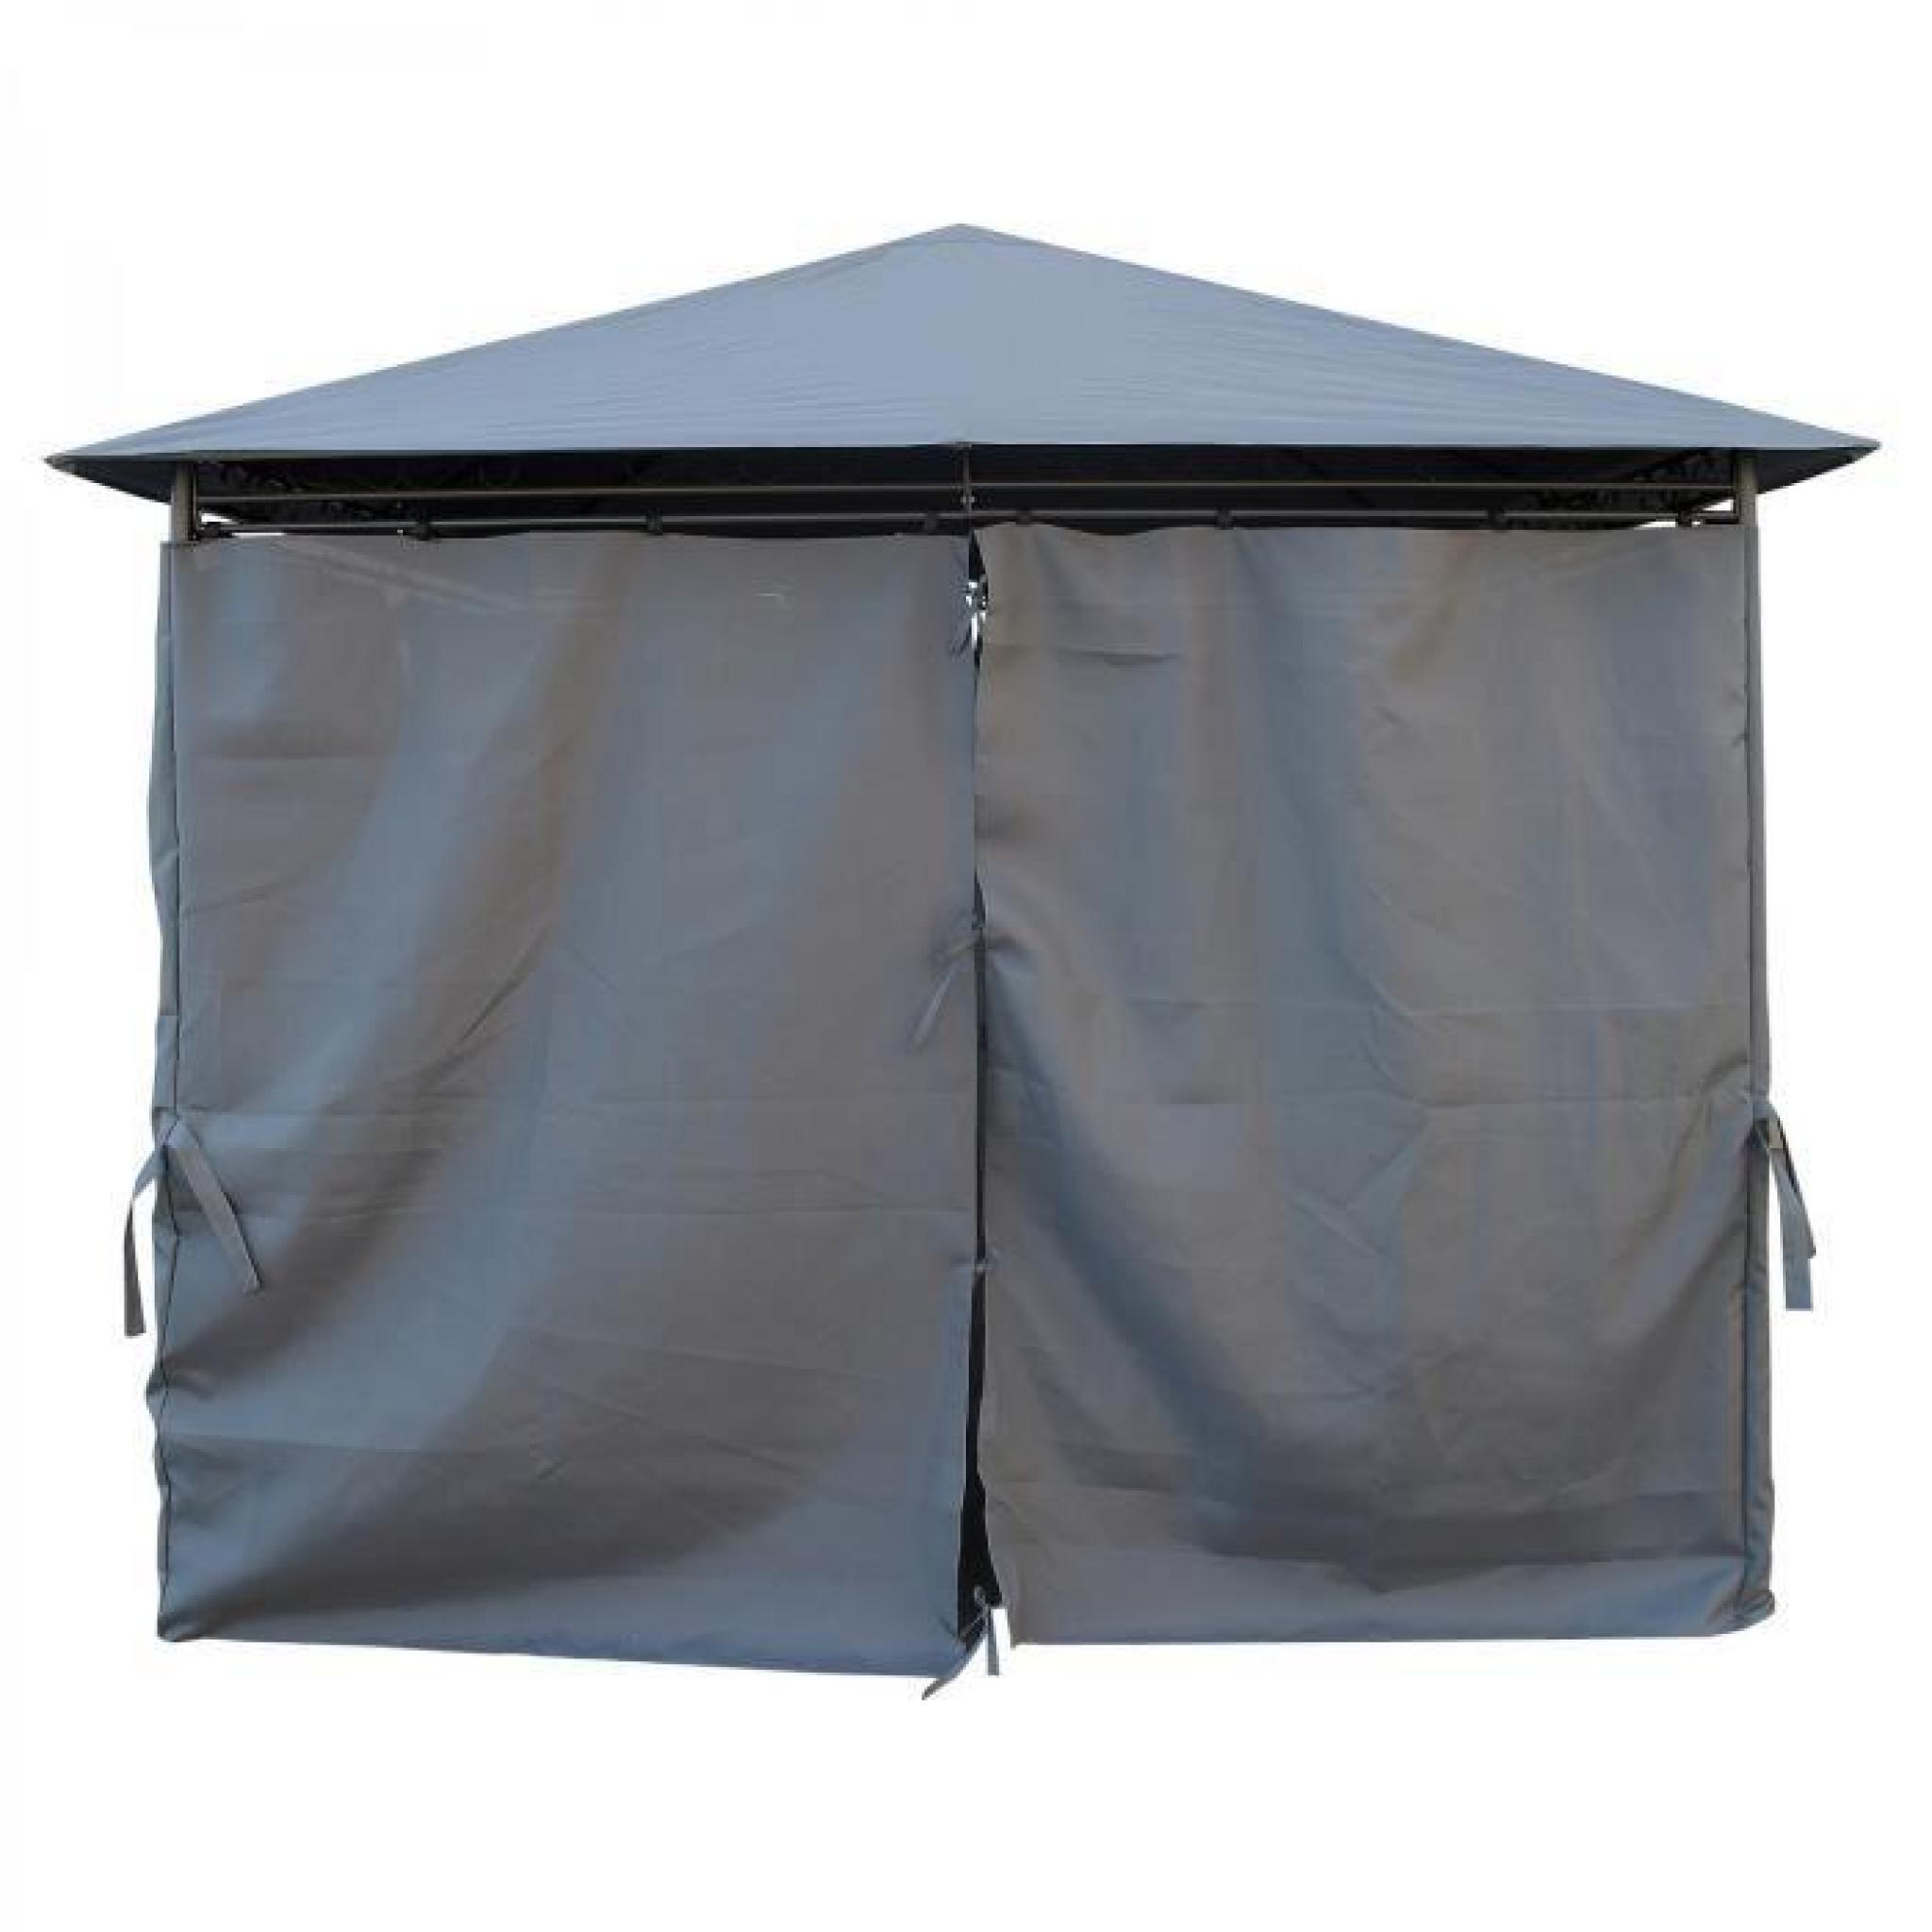 Kaligagan - Tente De Jardin Pergola 3X3M Gris Anthracite Tonnelle, Barnum serapportantà Tonnelle De Jardin Carrefour